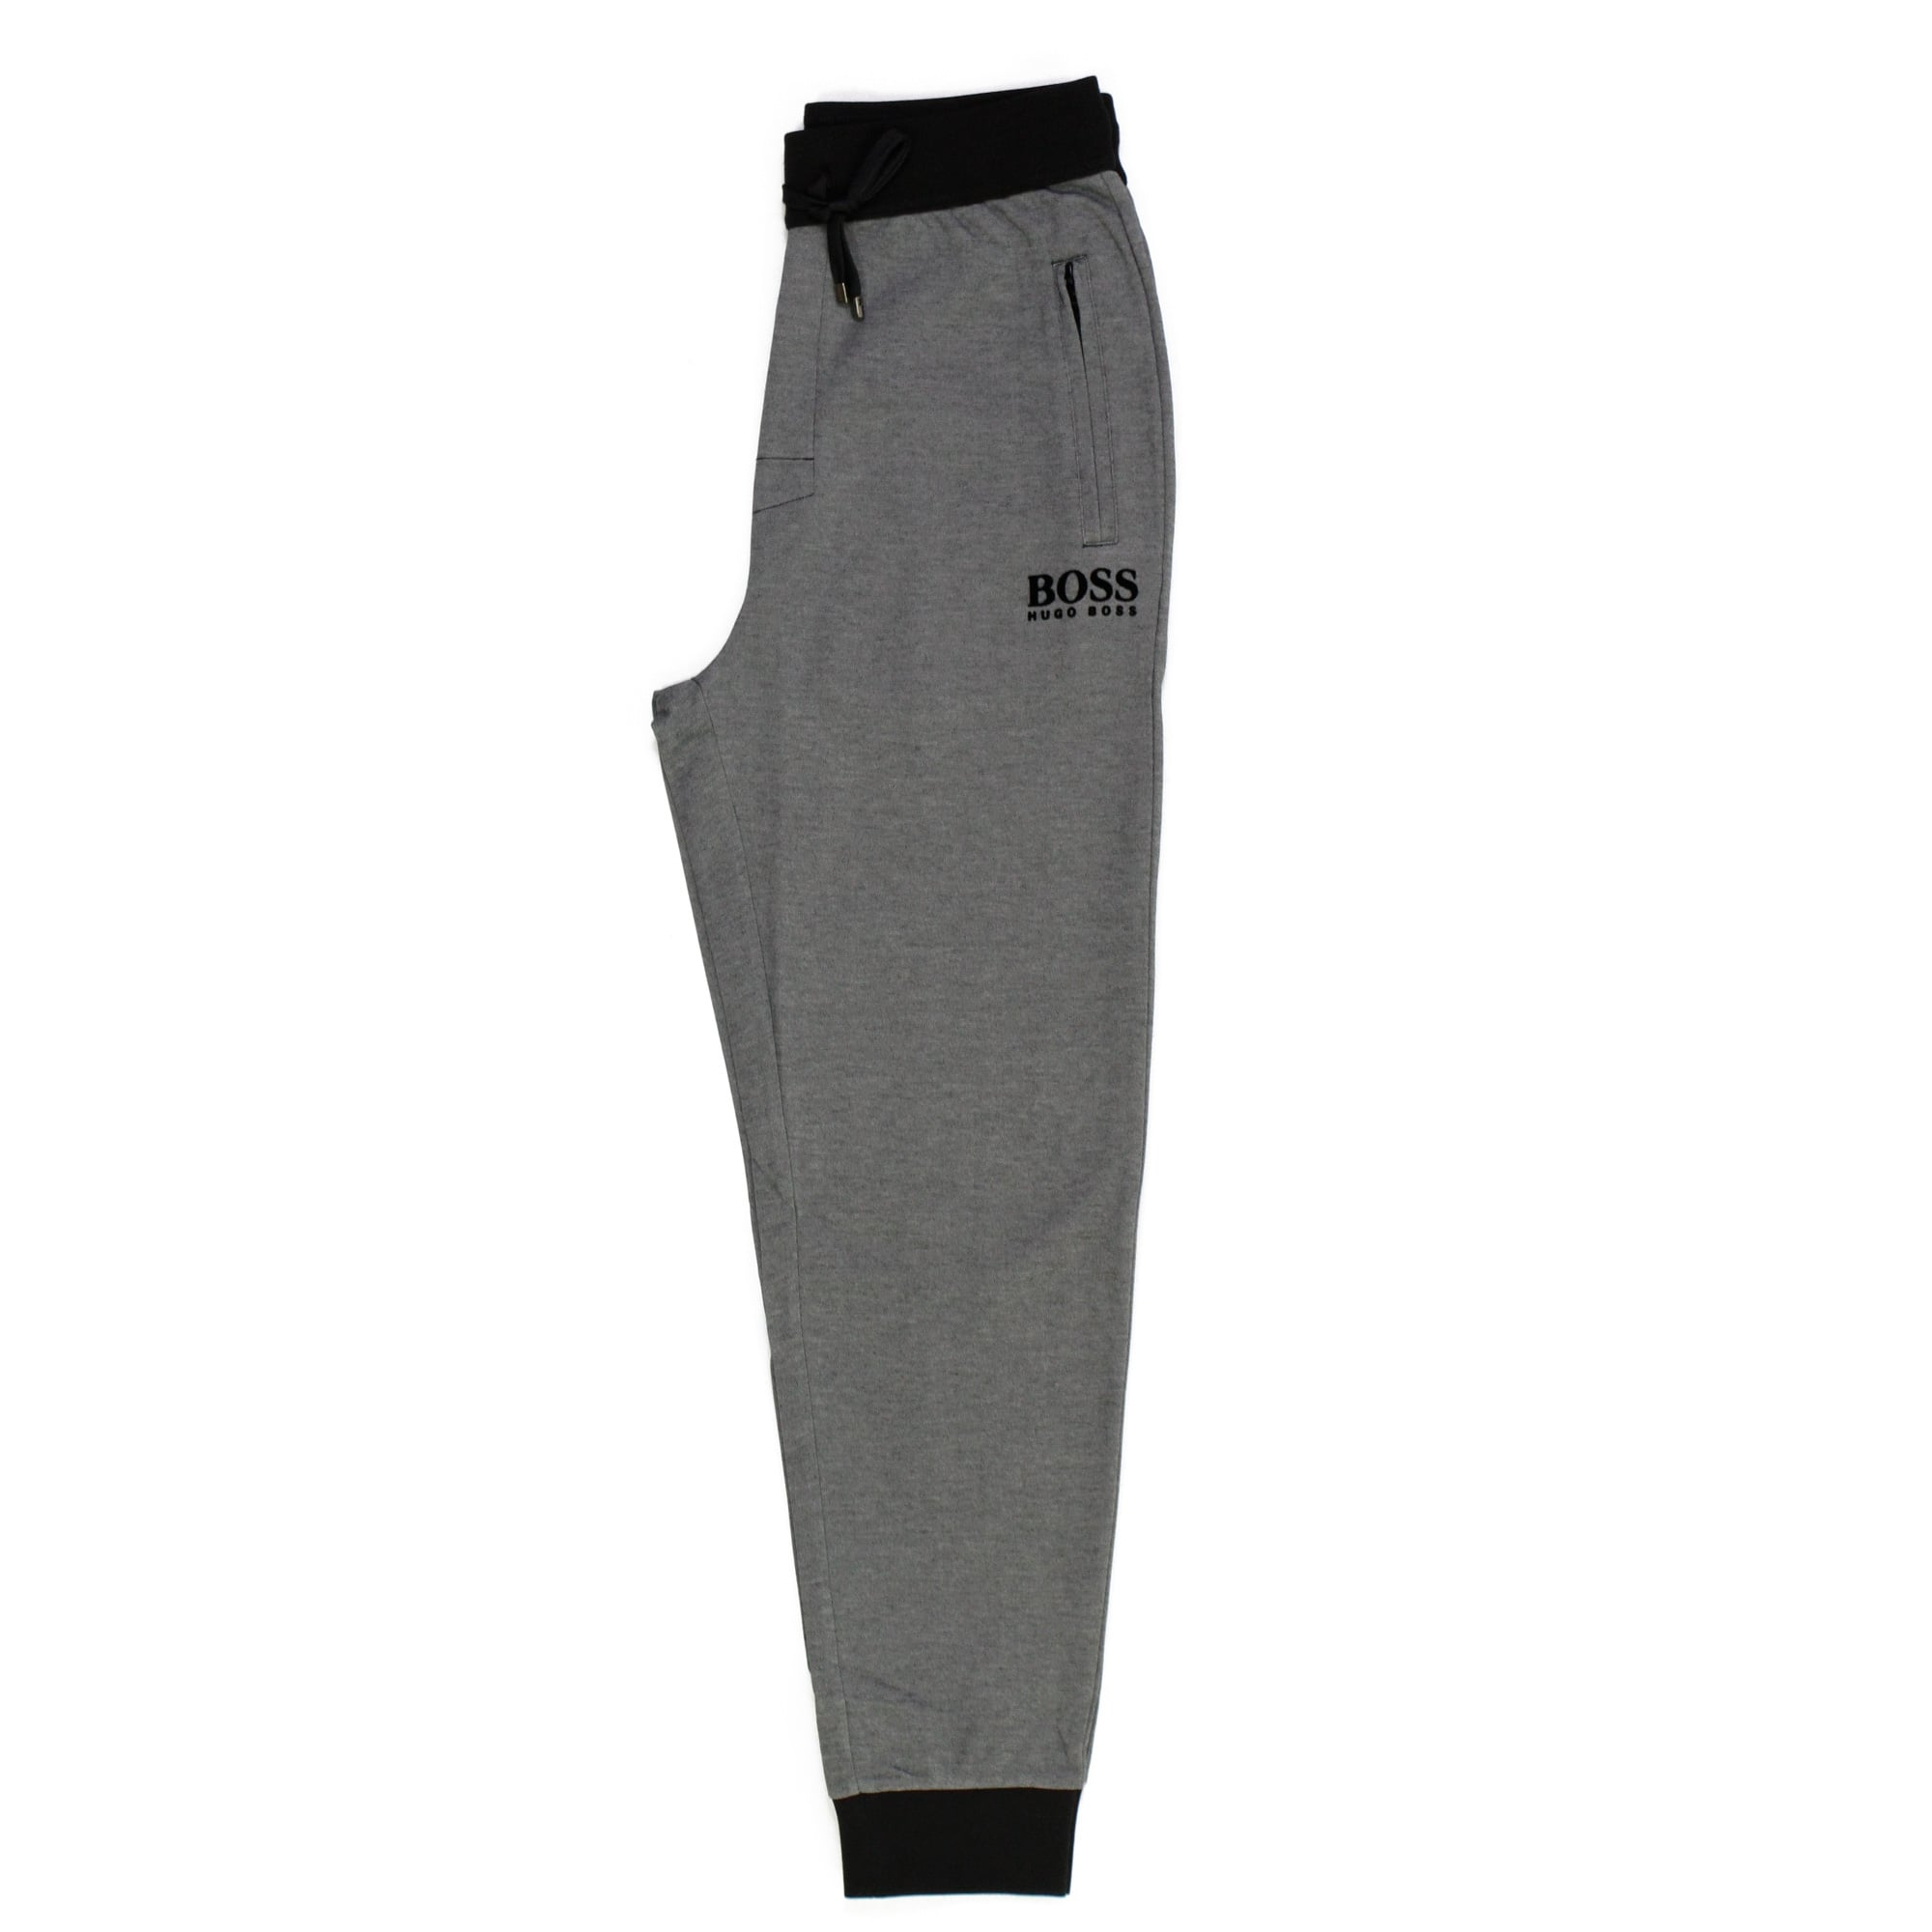 3179ba10 Hugo Boss Long Pant Cuffs Black Track Pants 50326750